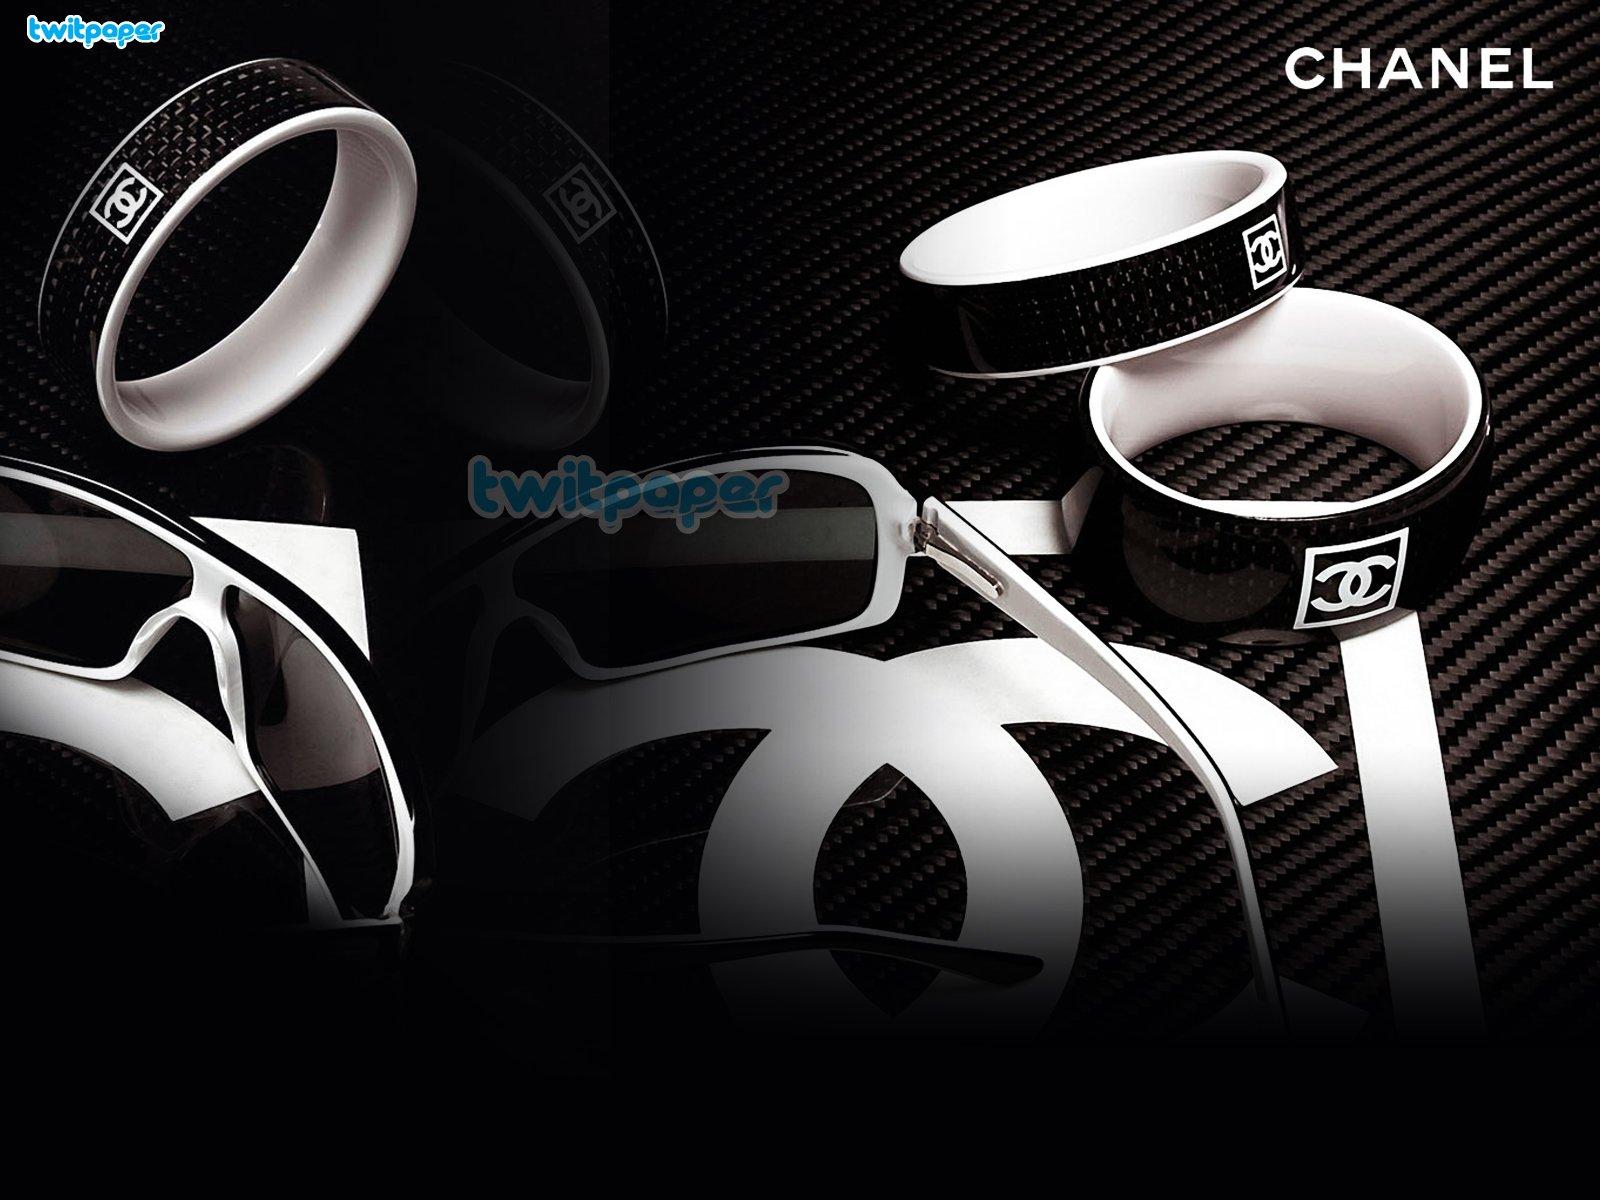 chanel logo wallpaper hd chanel desktop ahoodieahoodie Car Pictures 1600x1200